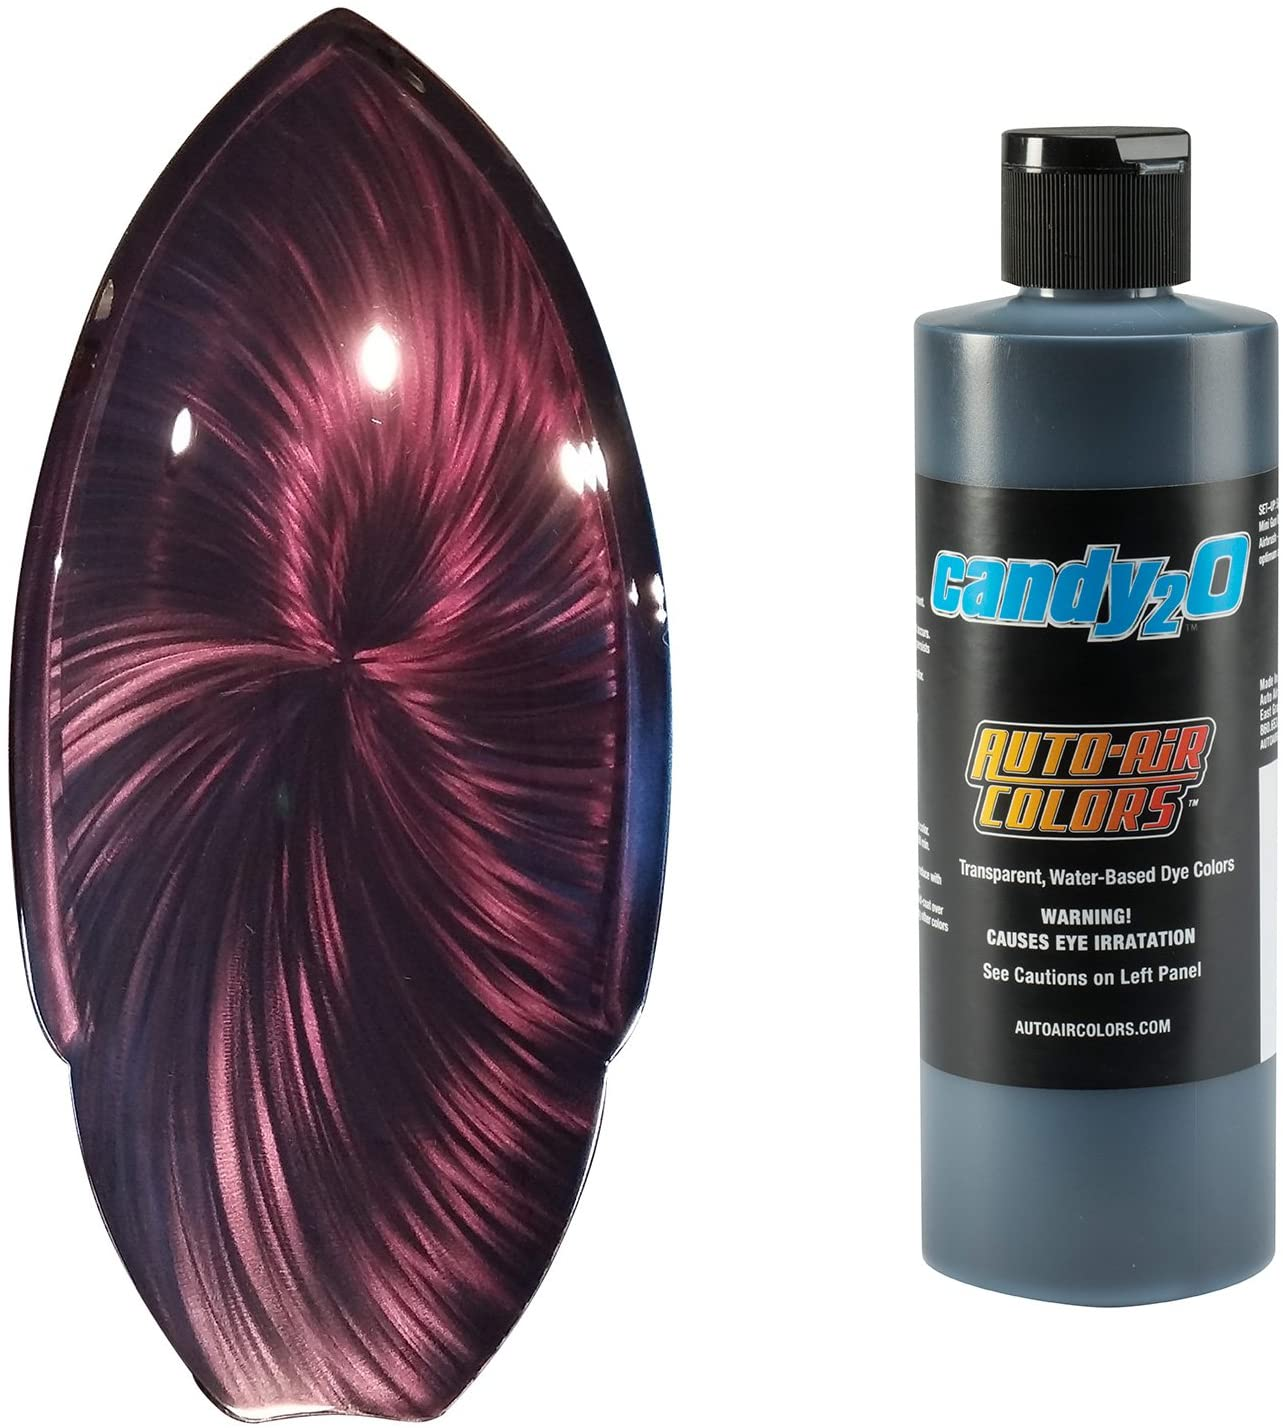 Createx Auto-Air Colors Candy2o Black 4664 8oz Waterborne Custom Paints